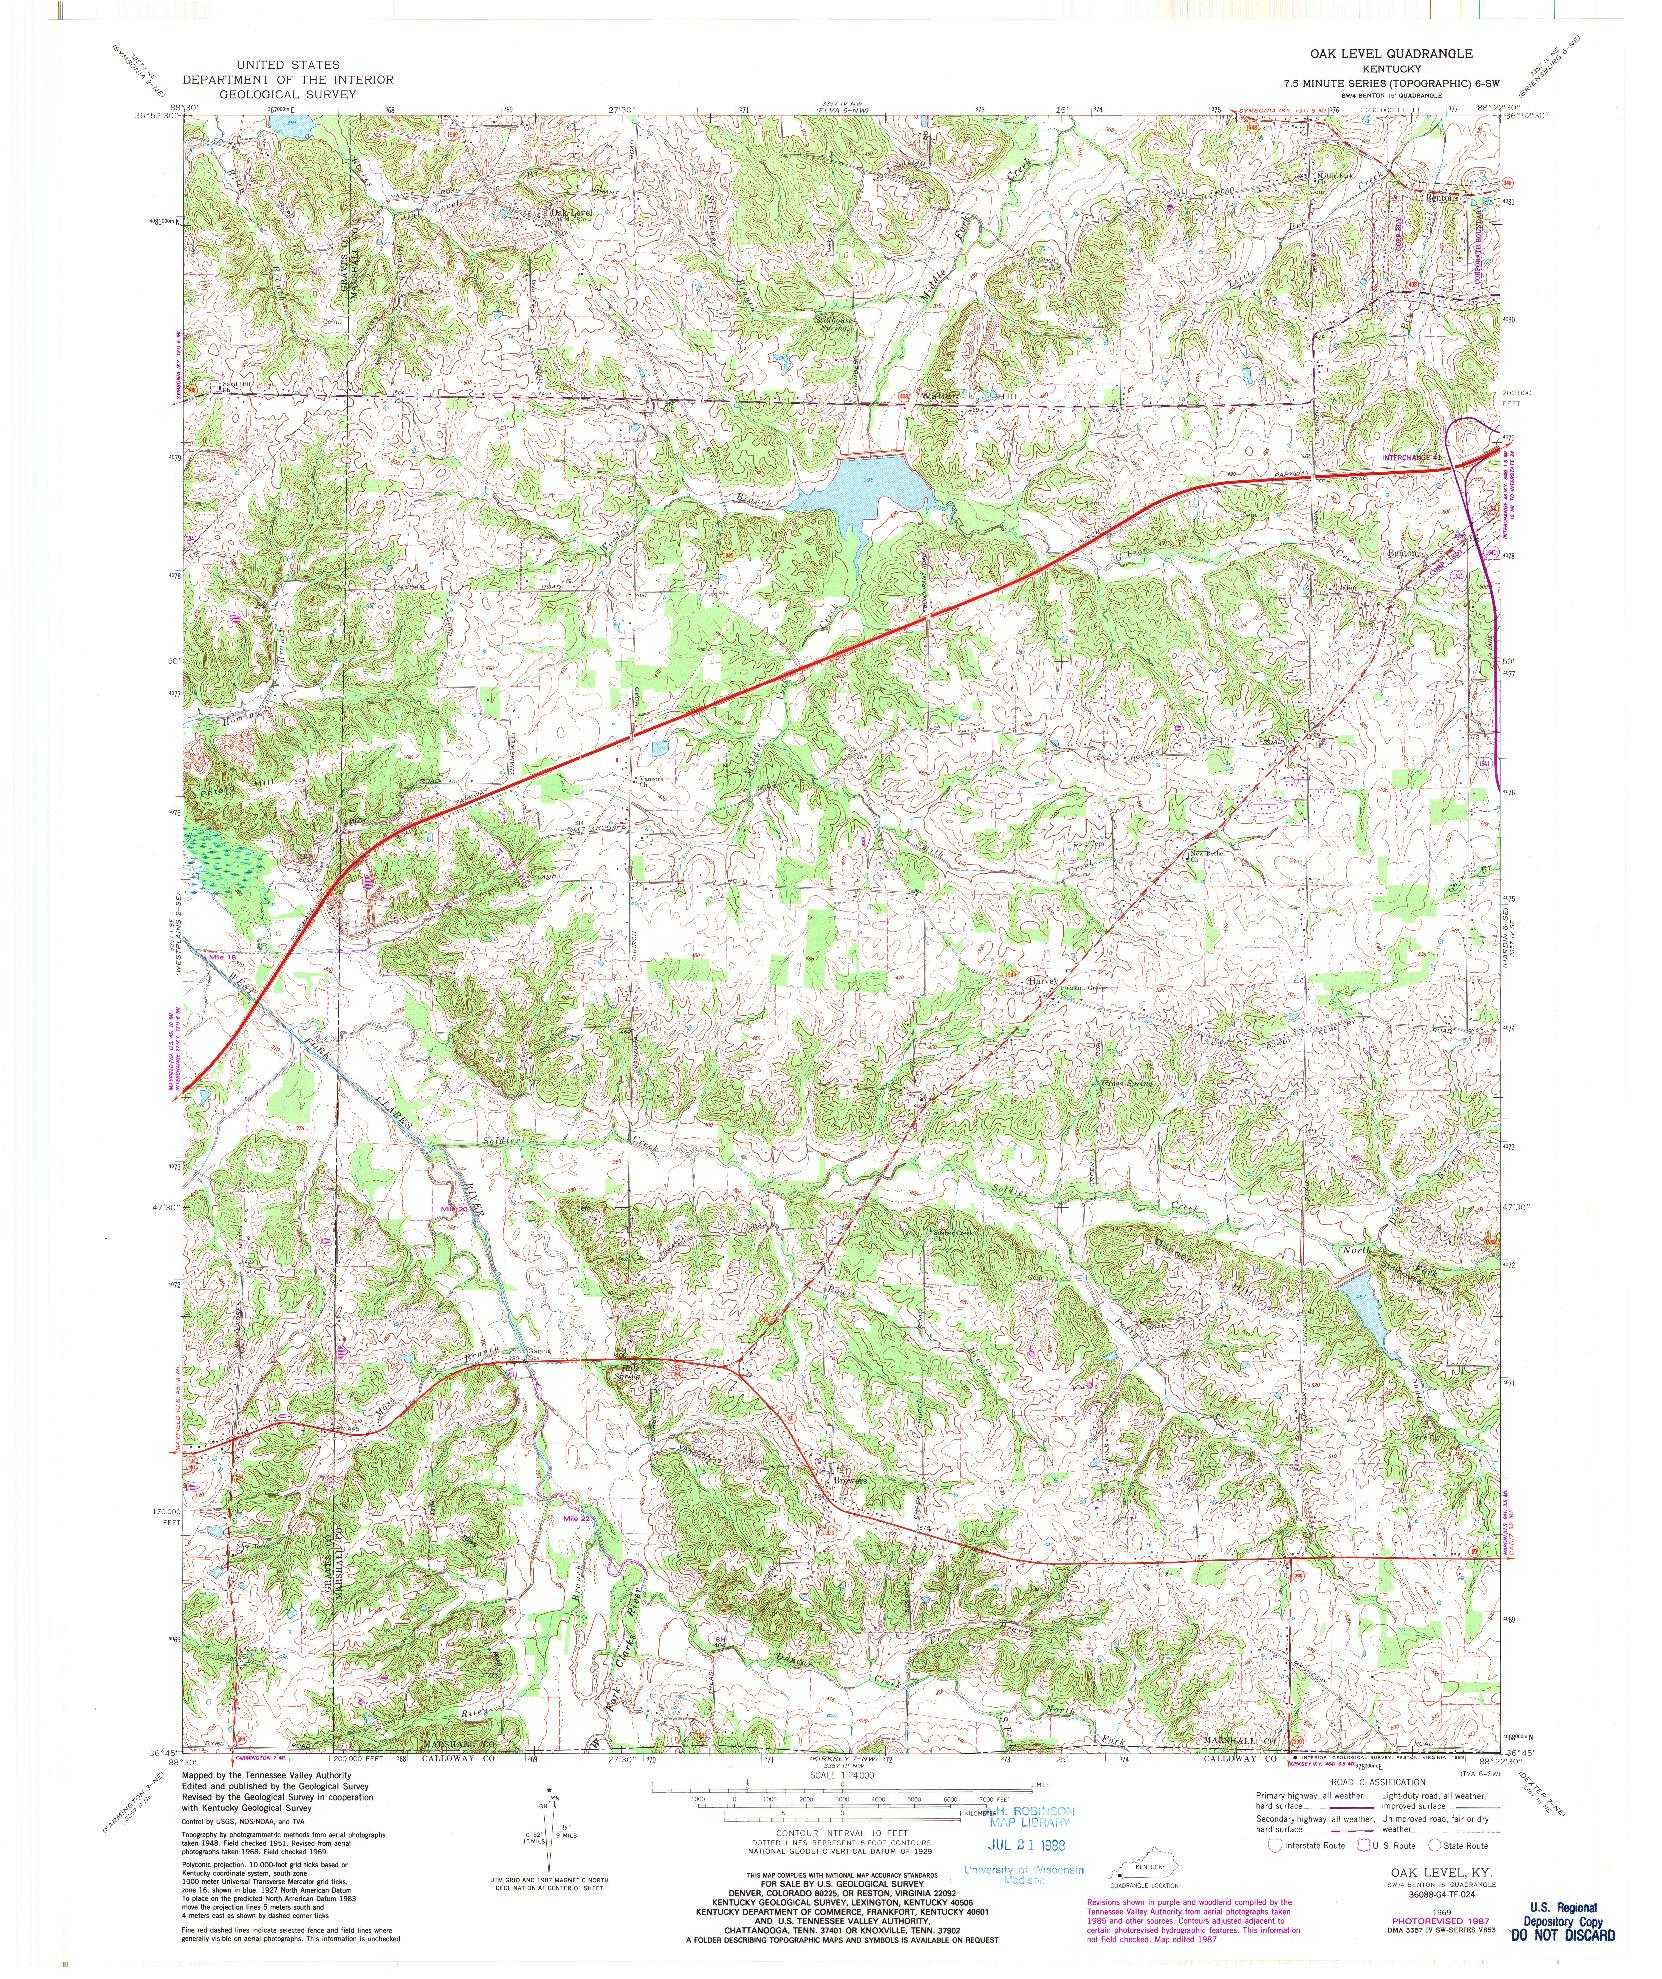 USGS 1:24000-SCALE QUADRANGLE FOR OAK LEVEL, KY 1969